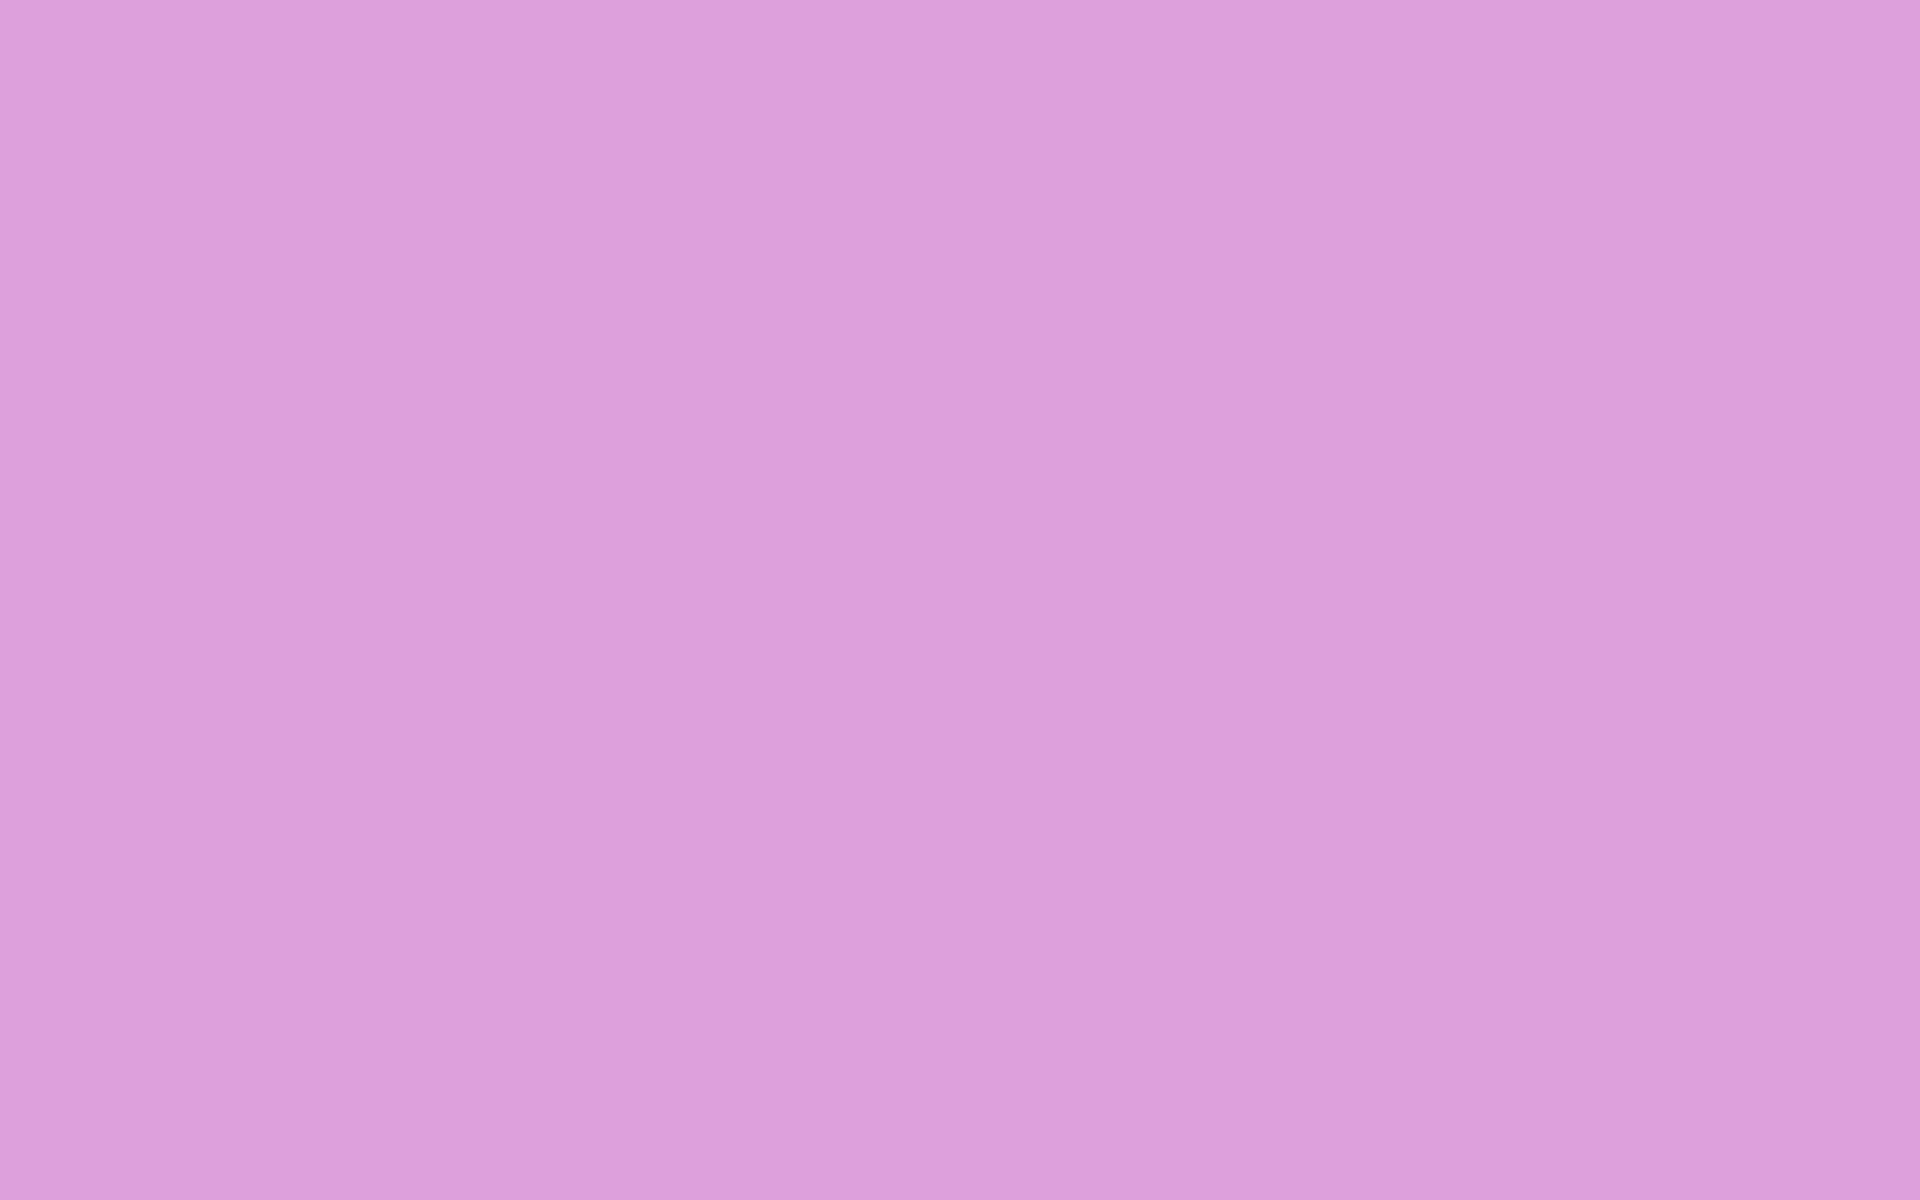 1920x1200 Plum Web Solid Color Background